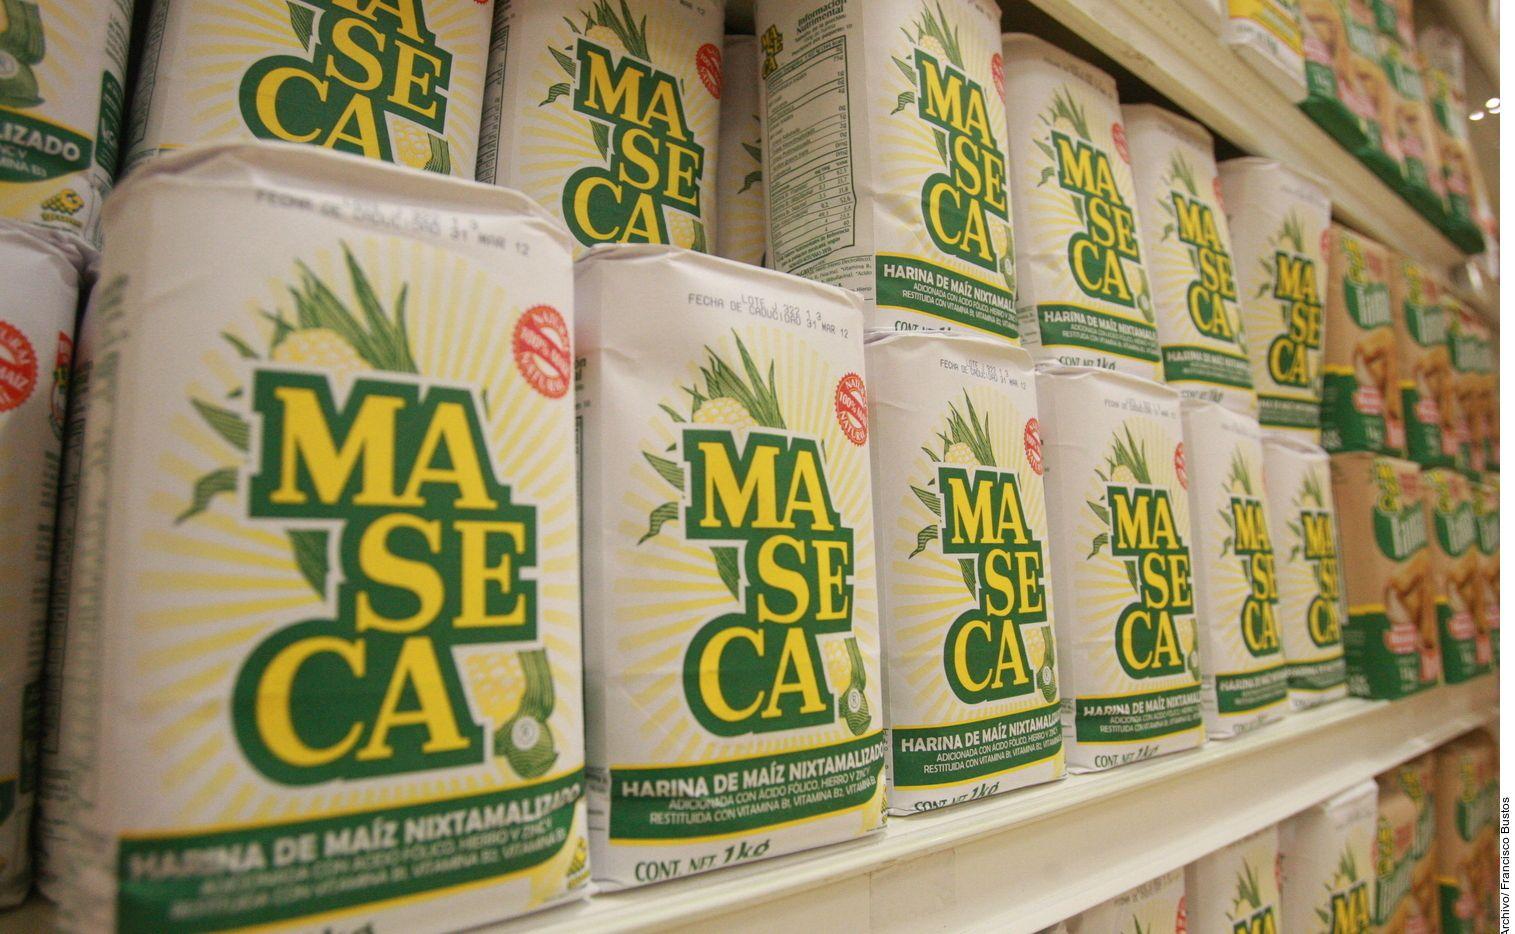 Bolsas de harina de maíz de la marca Maseca, en México.